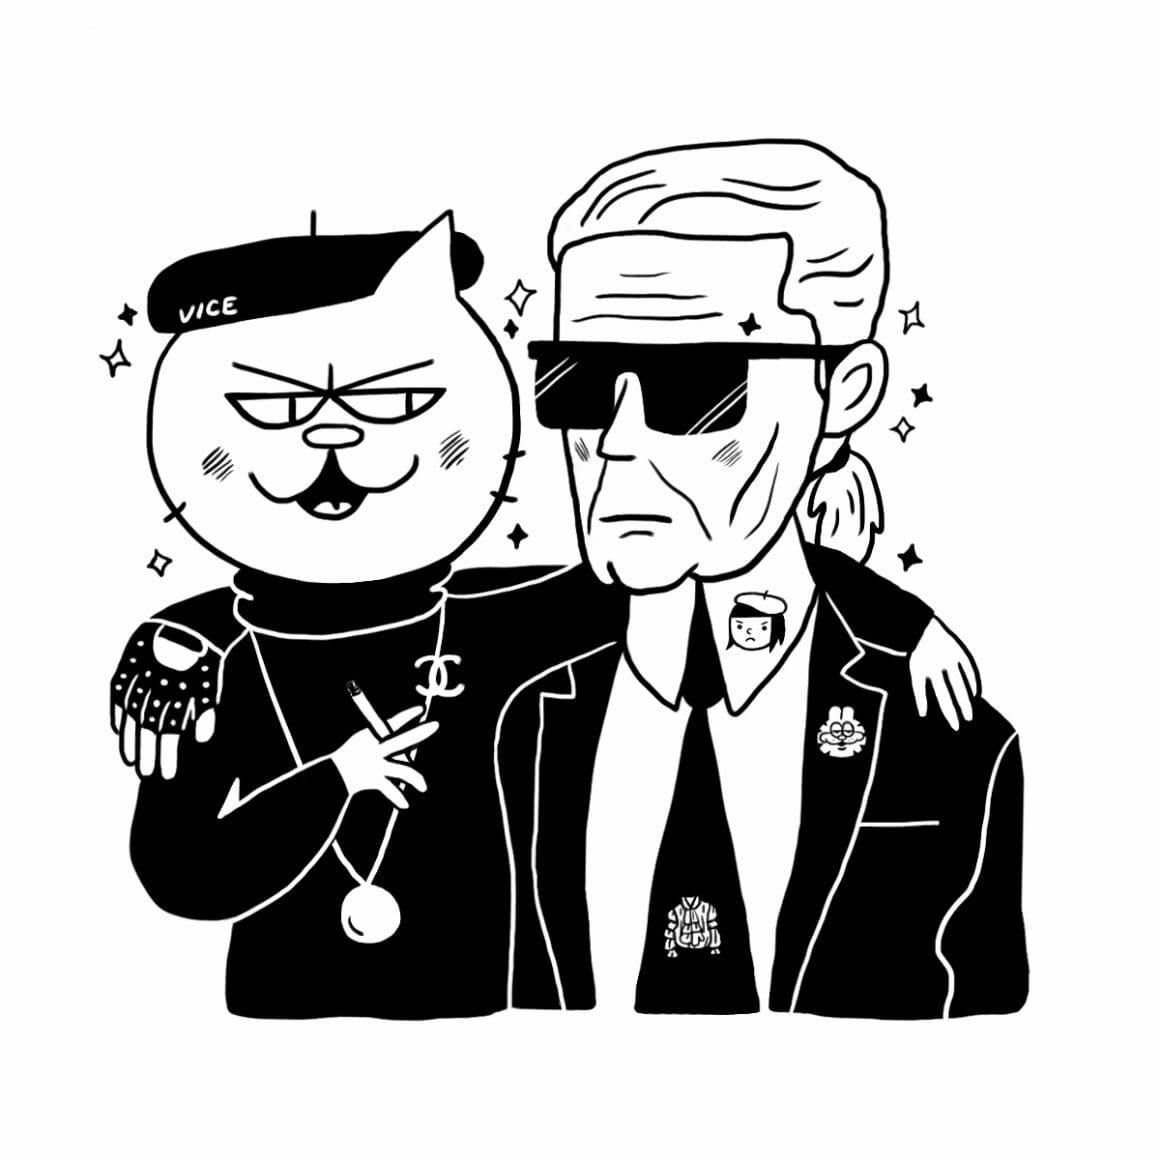 Karl Lagerfeld et sa chatte Choupette griffée en Chanel.